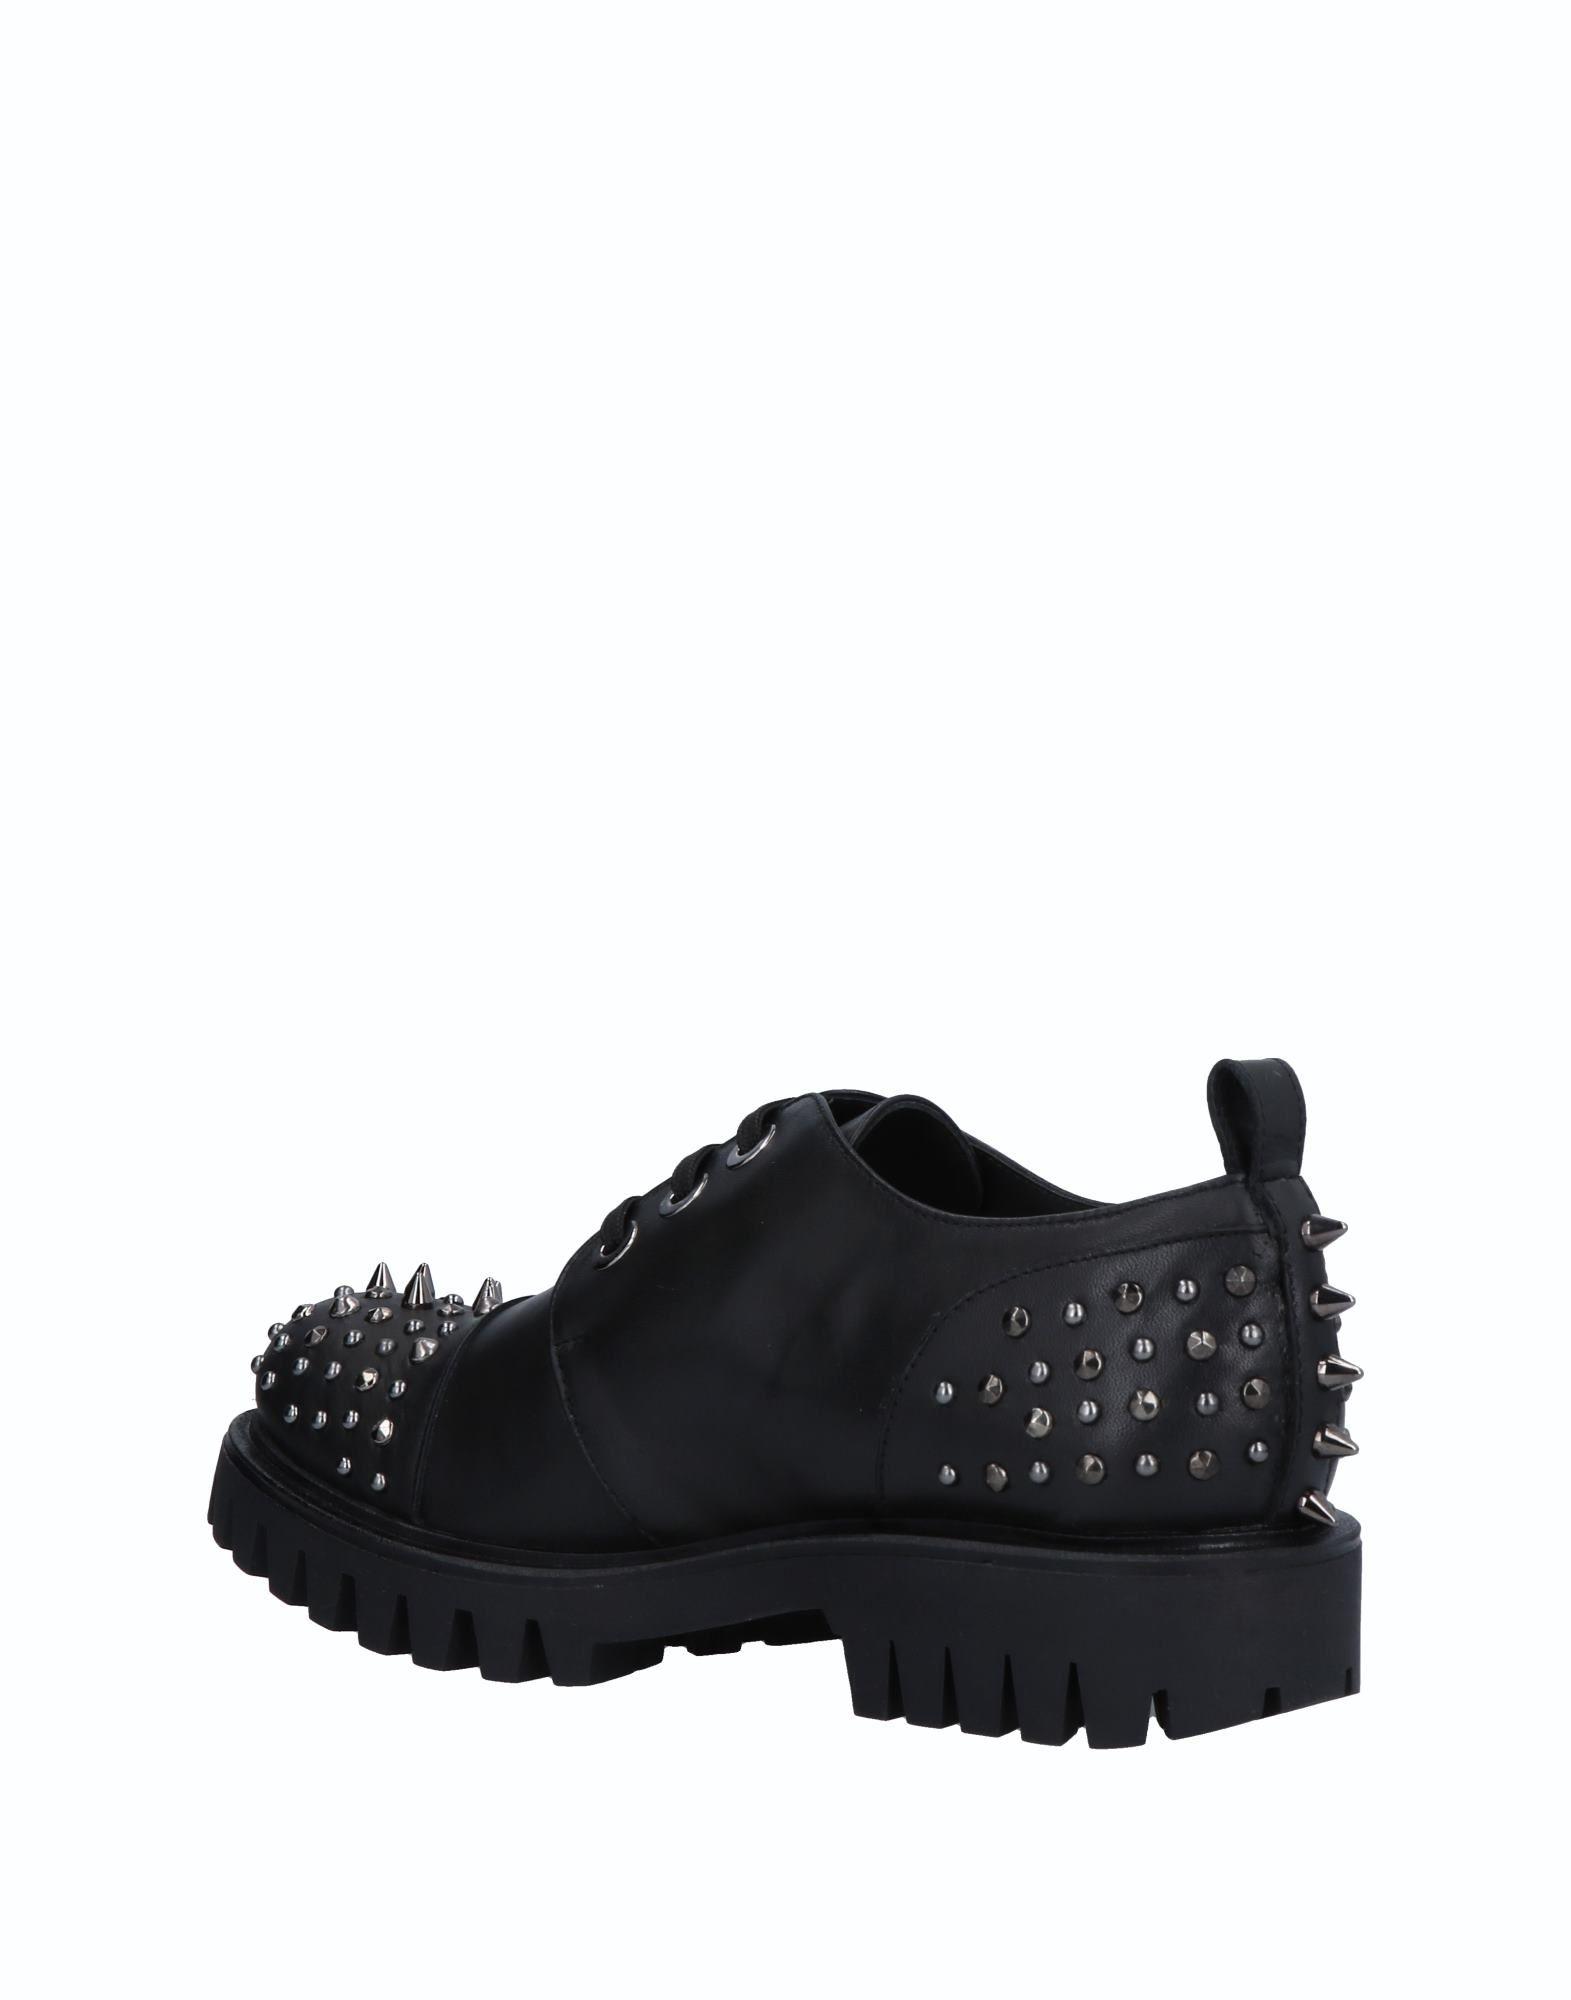 Haltbare Mode billige Schuhe Ras Schnürschuhe Damen  Schuhe 11504561HR Heiße Schuhe  a0c1a7